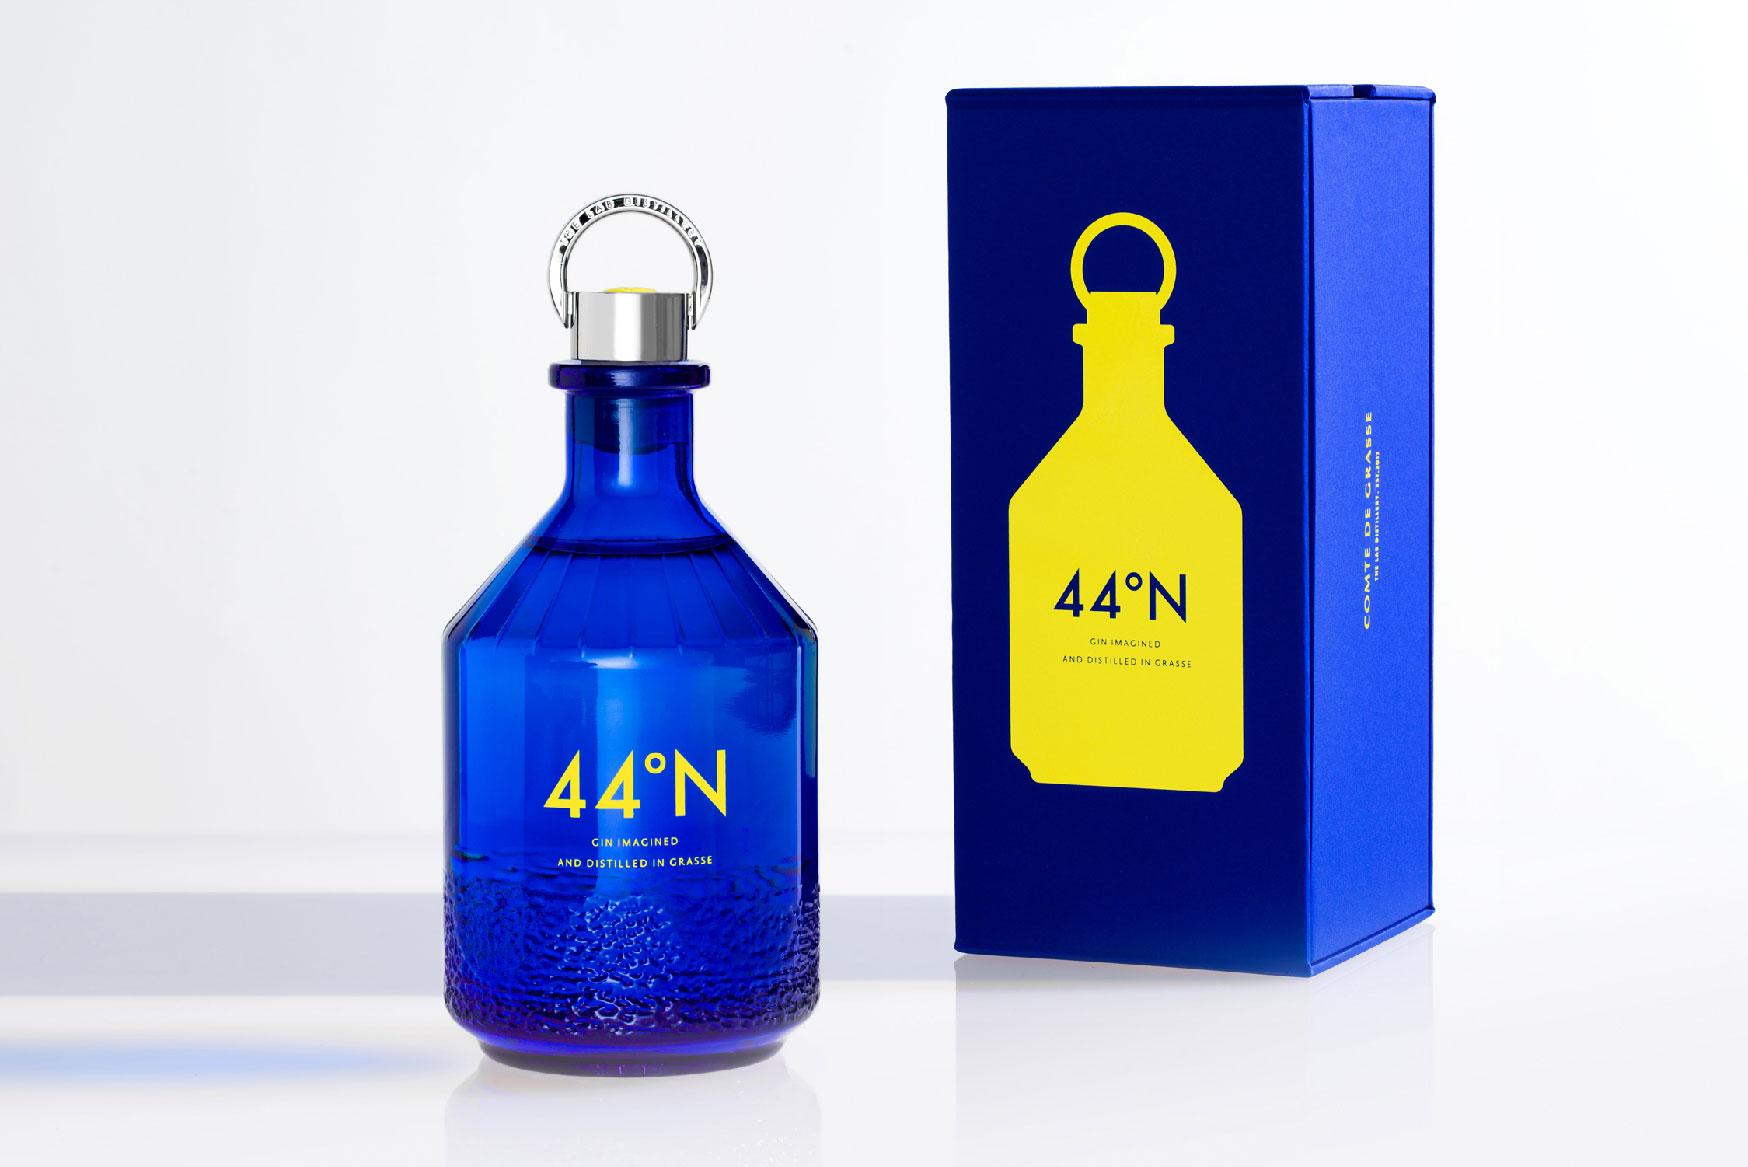 Comte De Grasse 44 N Gin